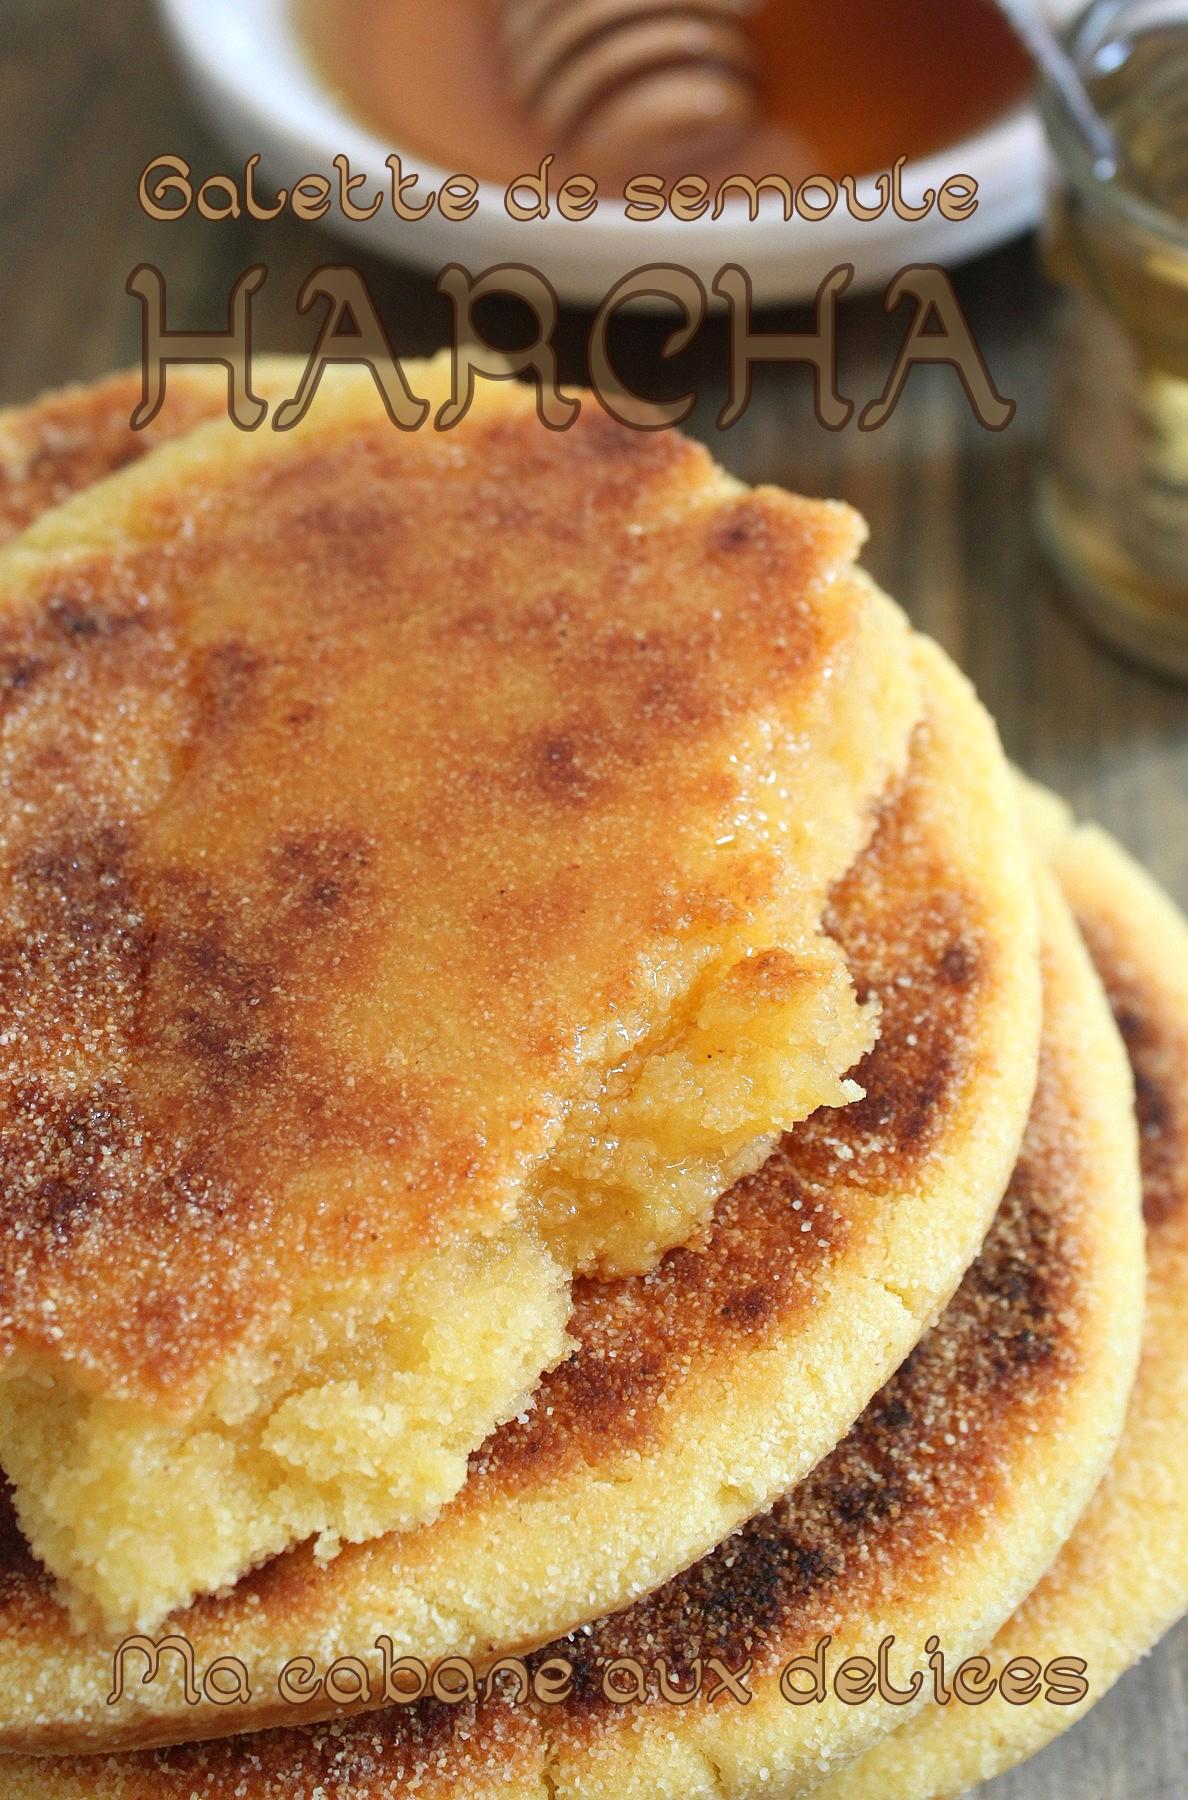 Harcha smid galette marocaine